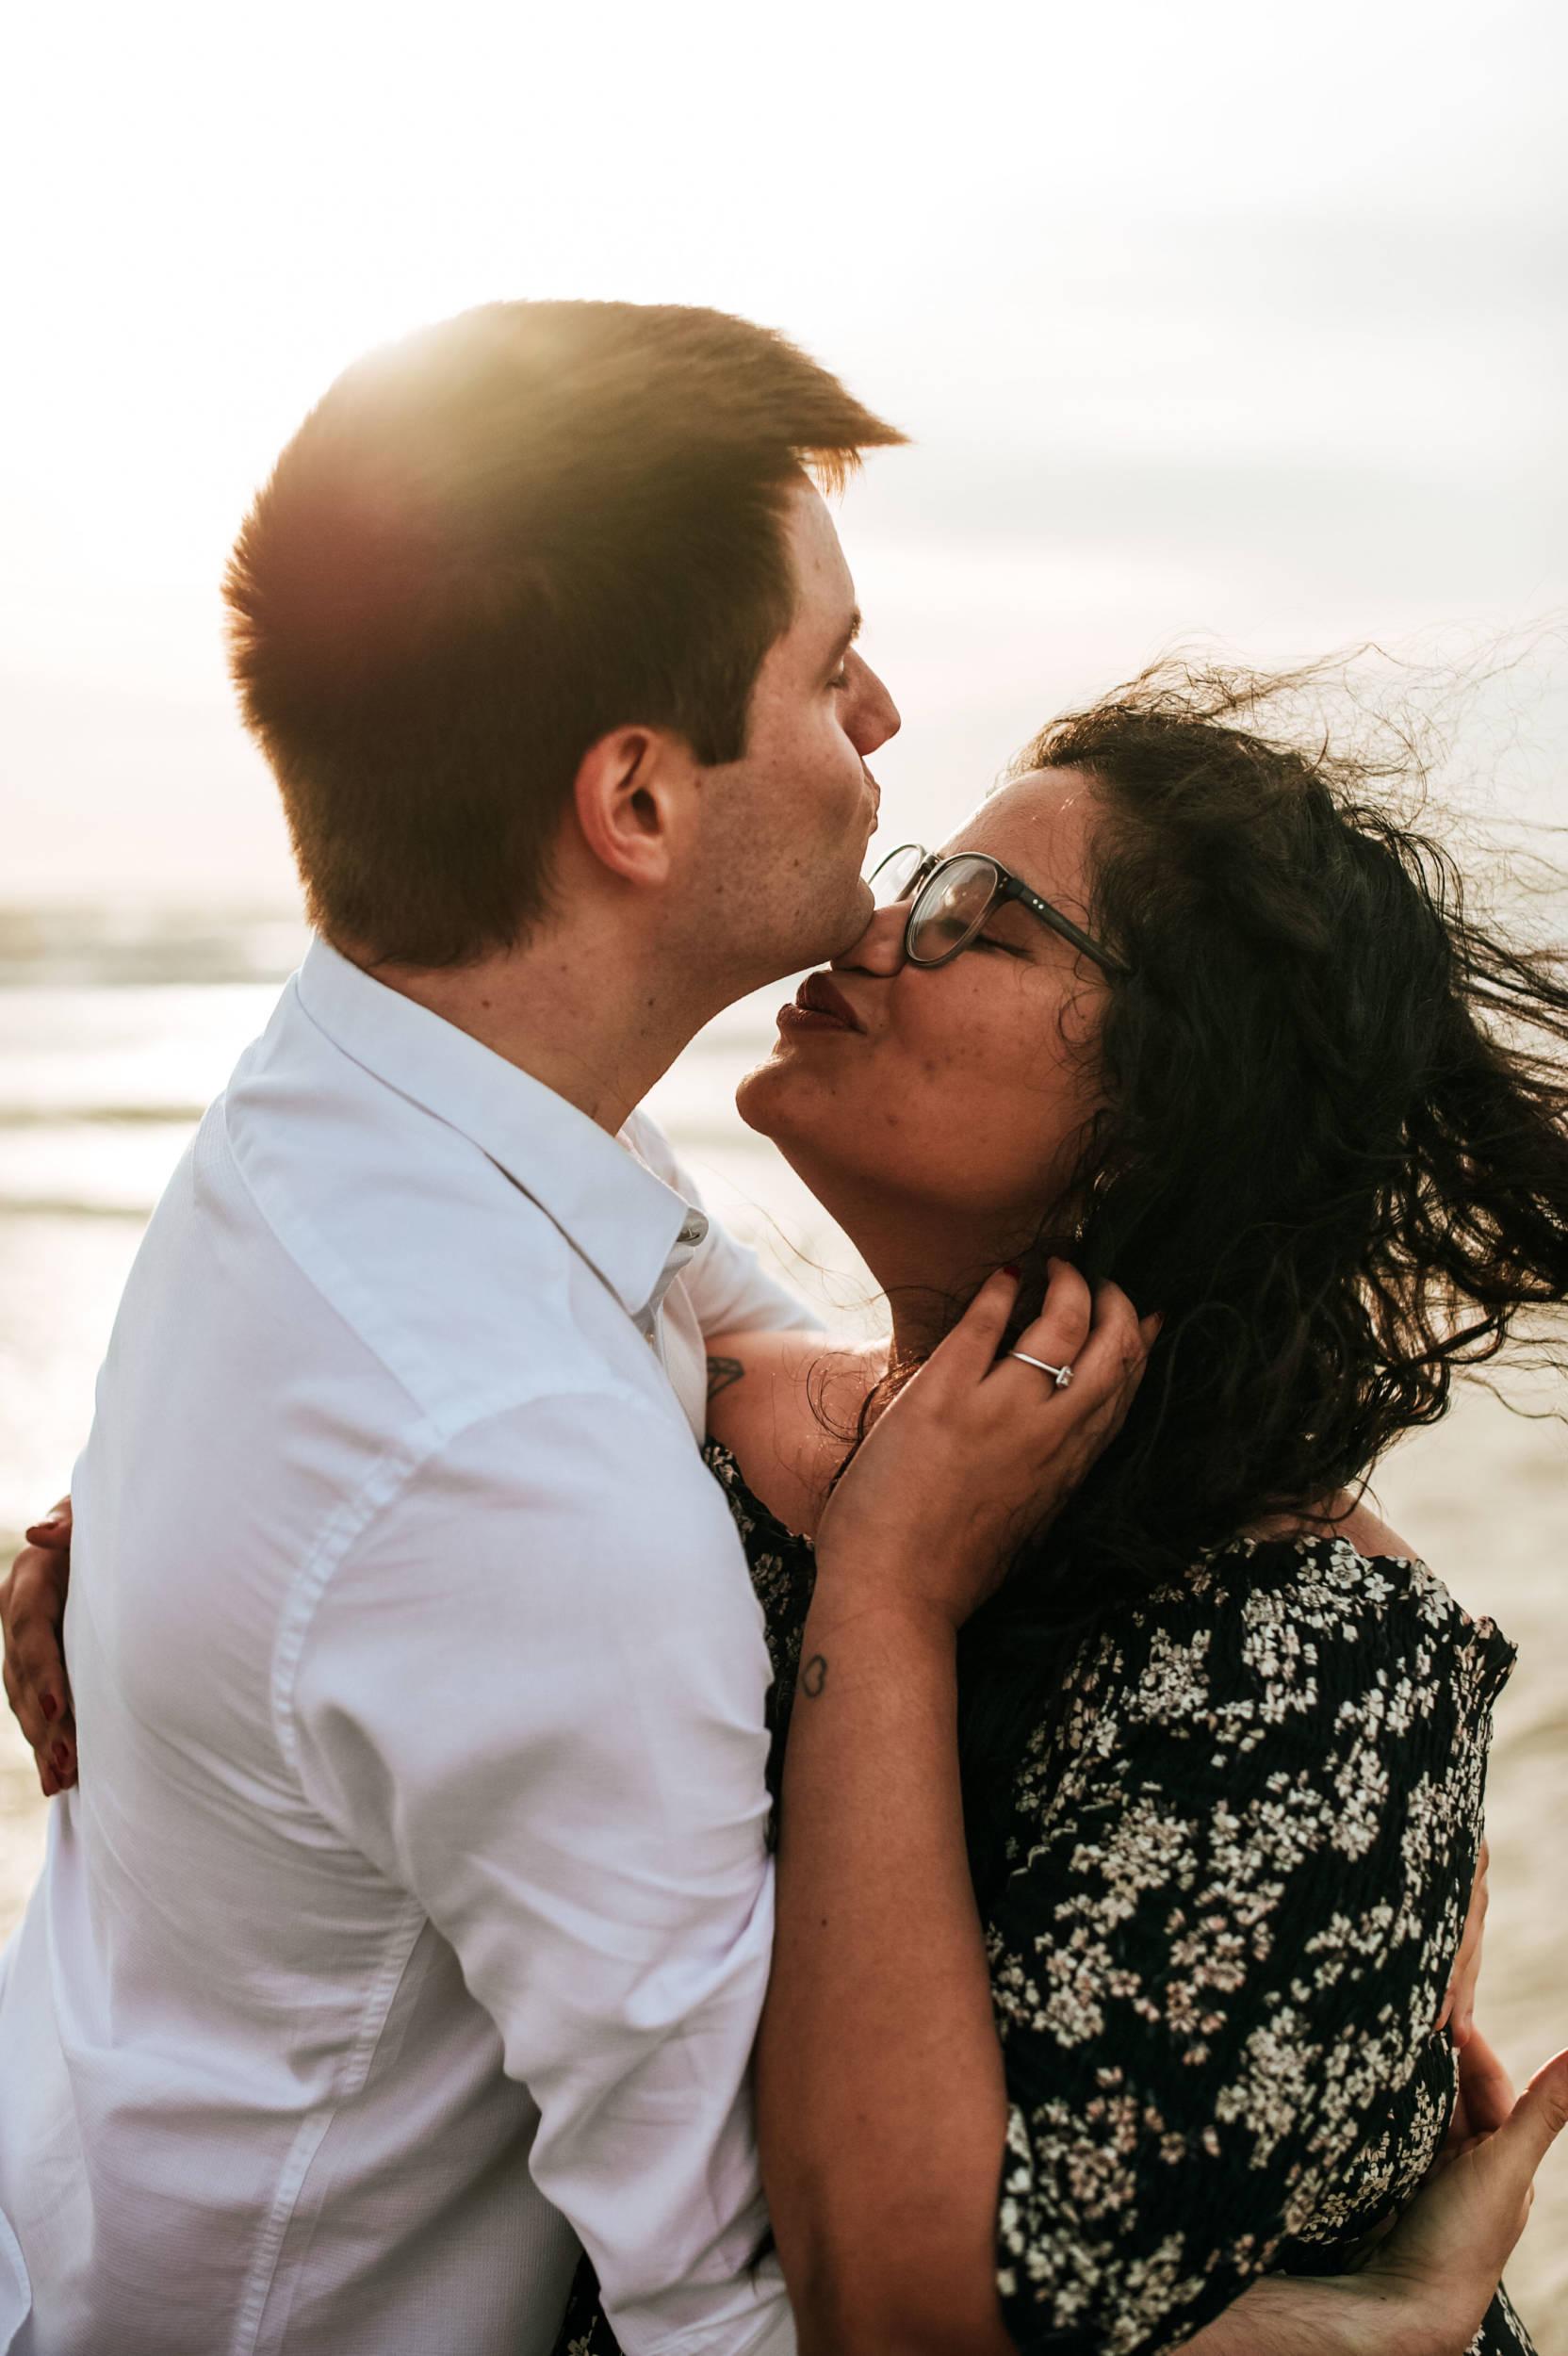 Engagement shoot